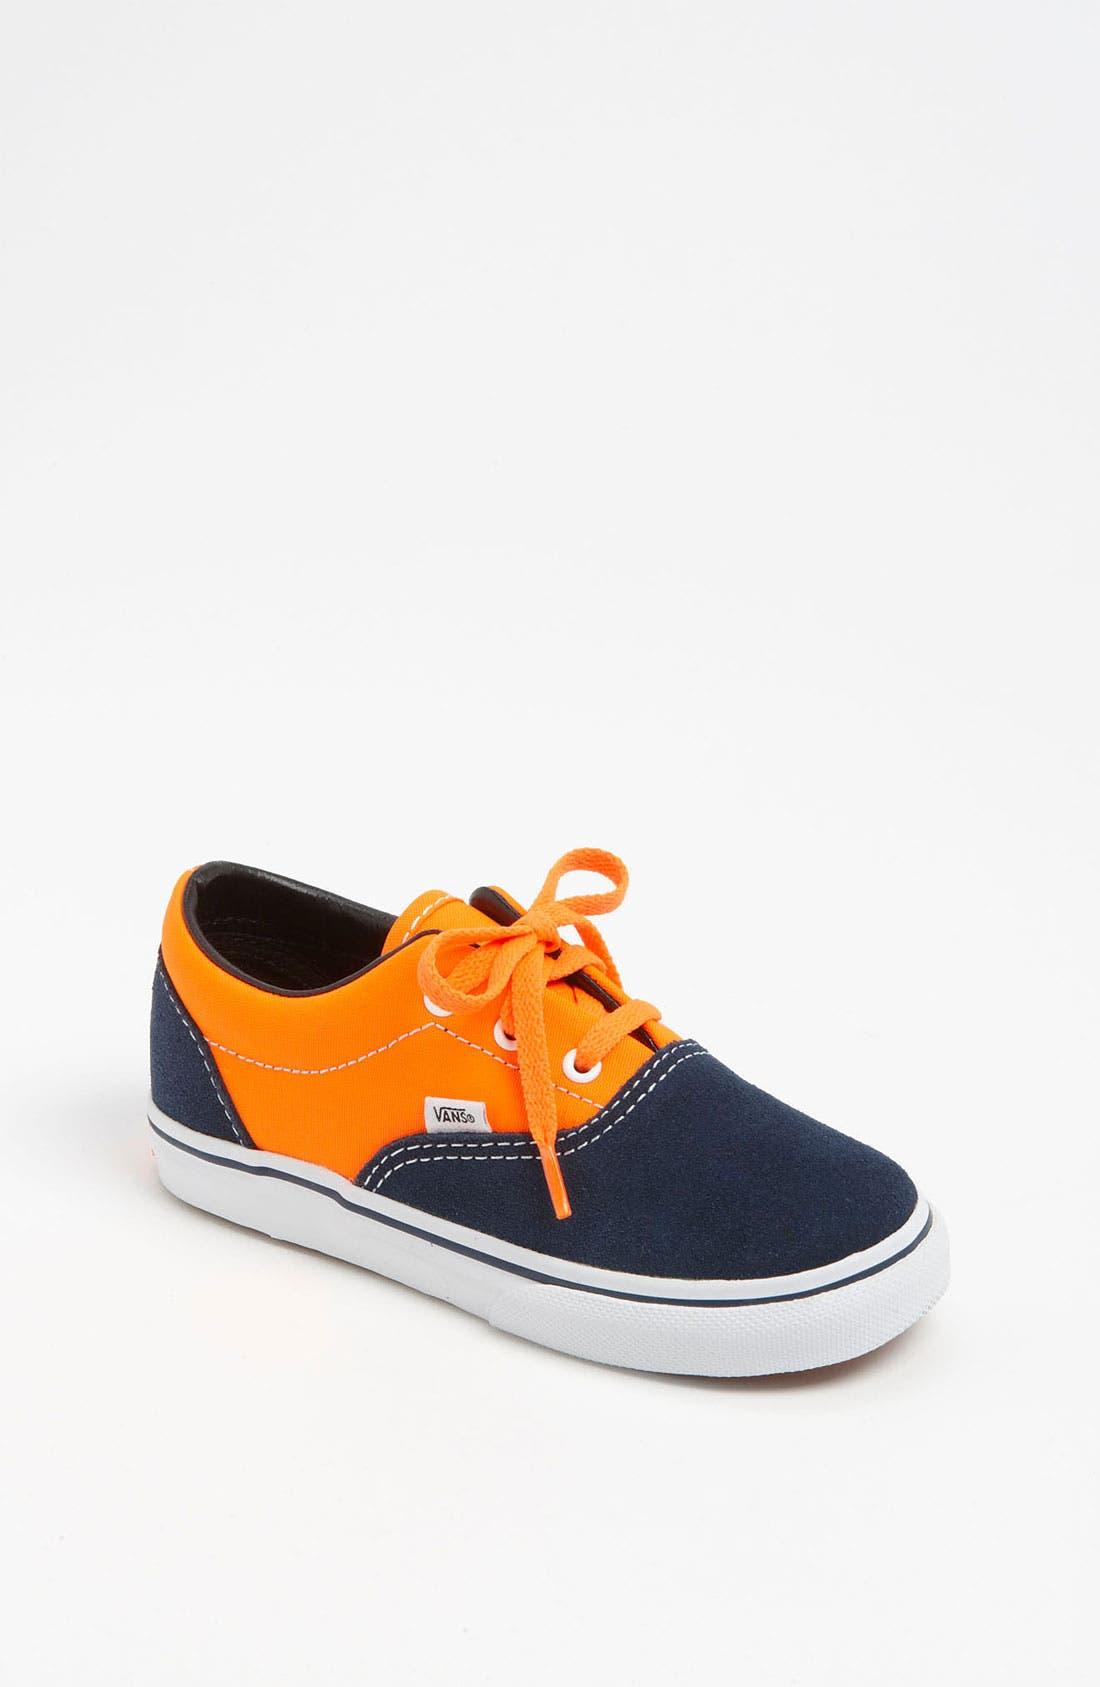 Alternate Image 1 Selected - Vans 'Era' Sneaker (Baby, Walker & Toddler)